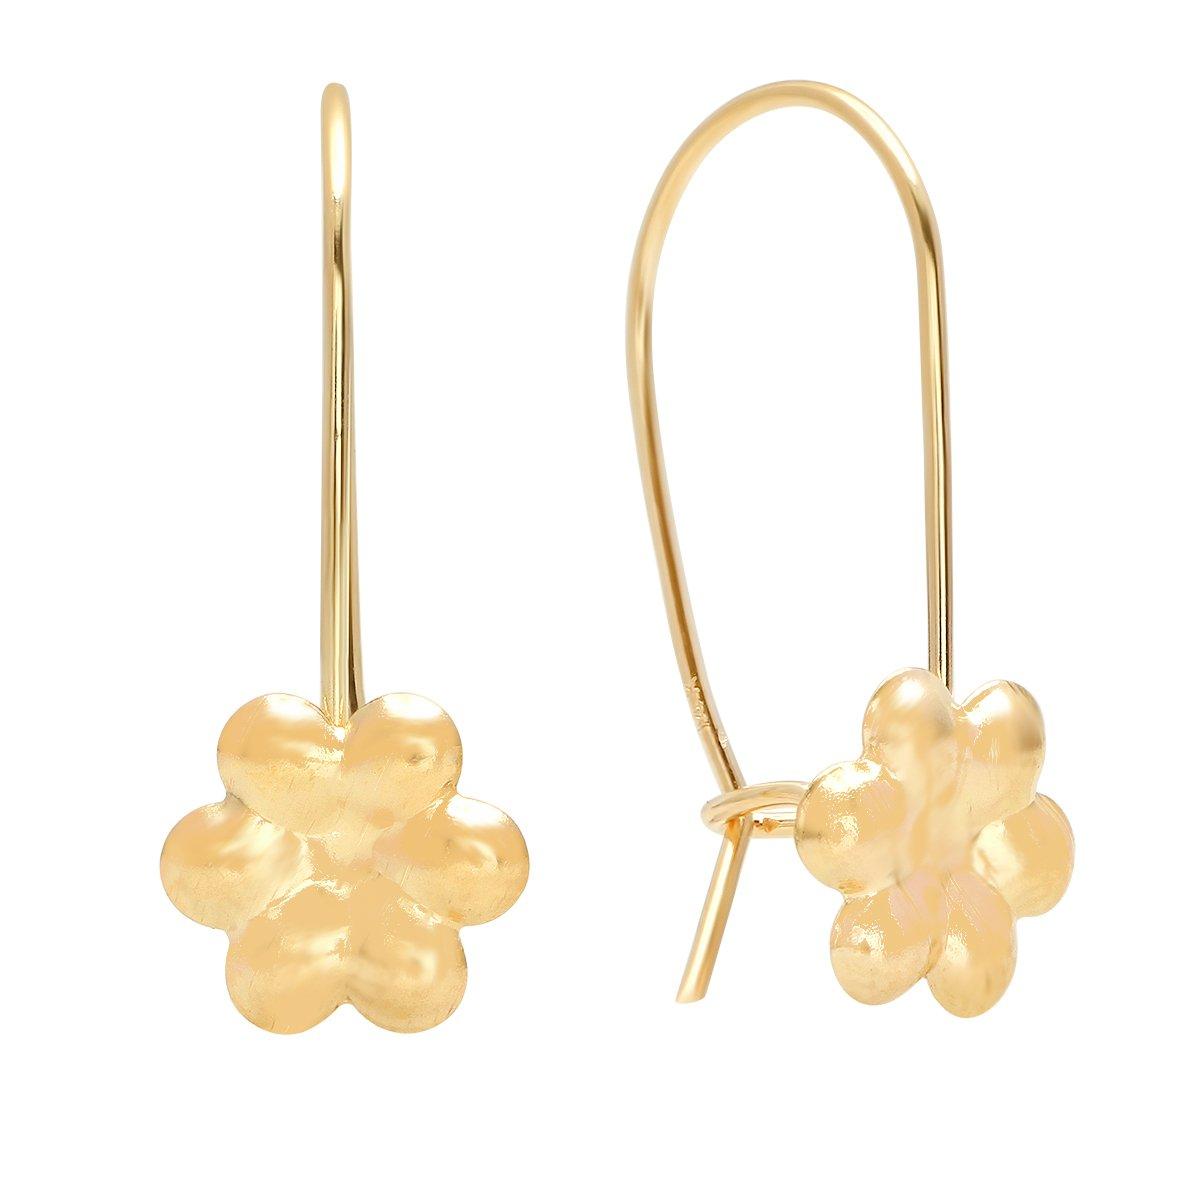 High Polish Shiny Finish Pori Jewelers 14K Solid Gold Lever-Back Flower Drop Earrings